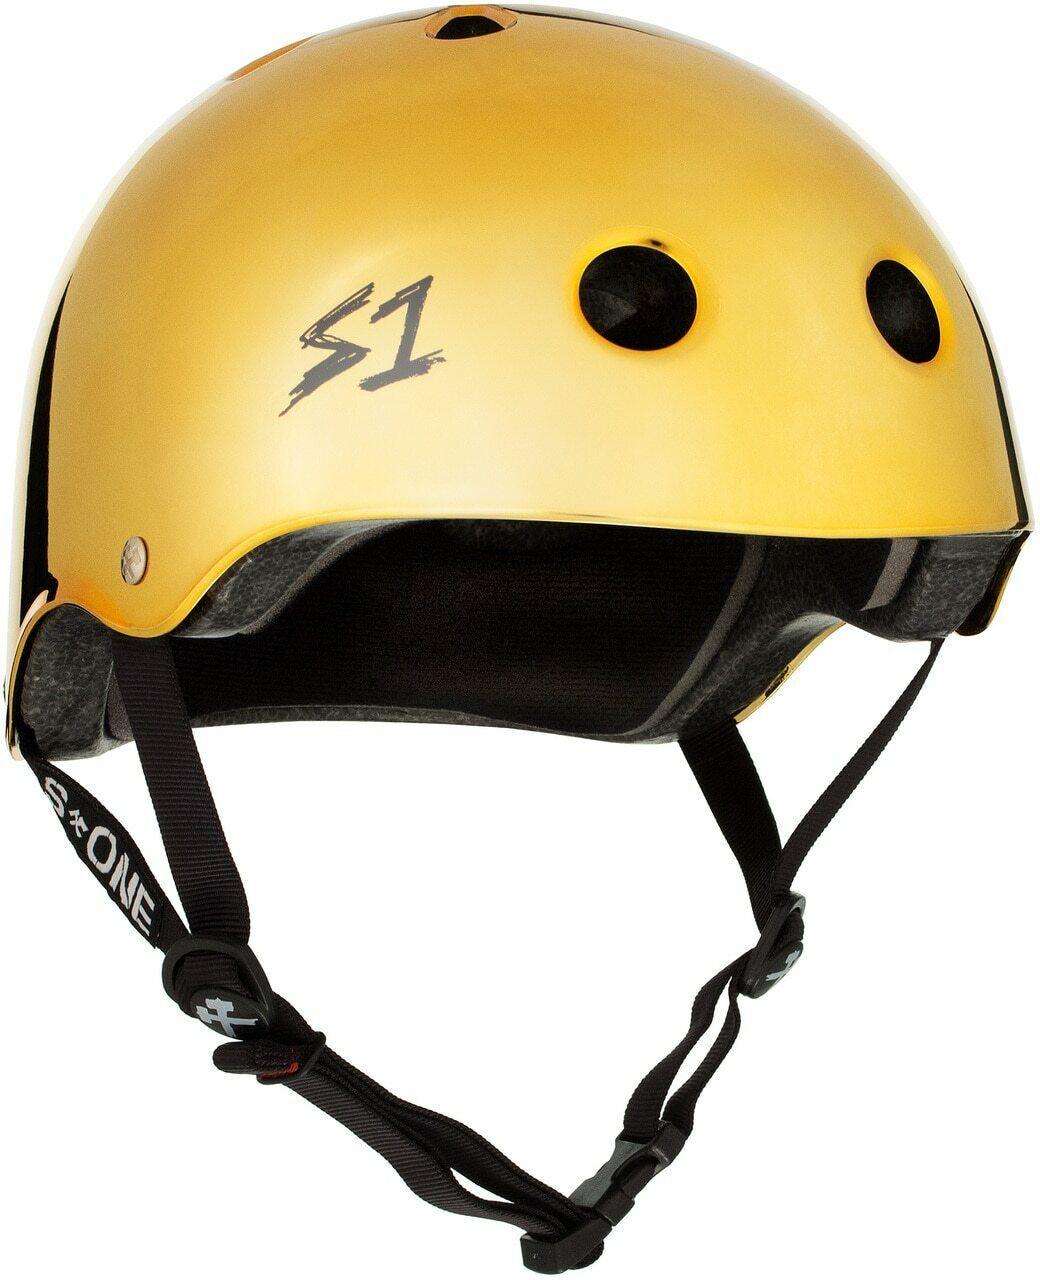 S1 Lifer  Helmet - gold Mirror Gloss  the best after-sale service